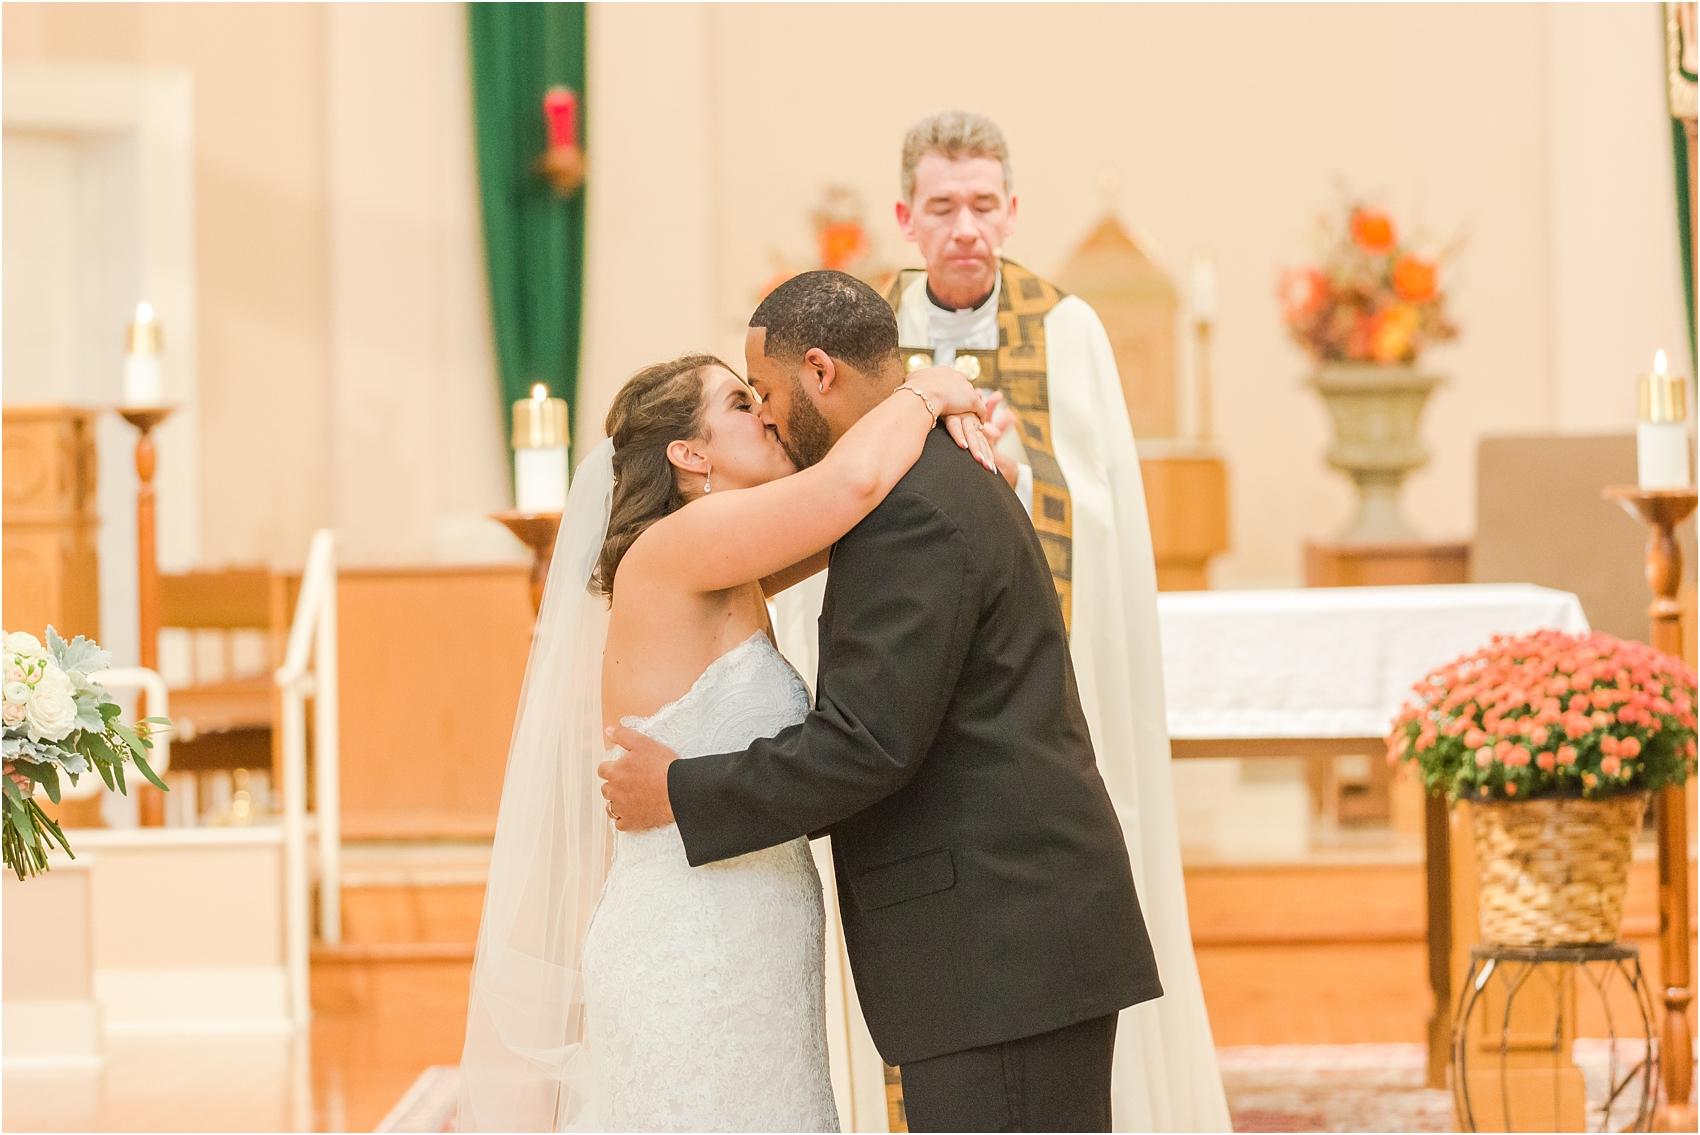 elegant-and-romantic-fall-wedding-photos-at-st-marys-catholic-church-in-monroe-michigan-by-courtney-carolyn-photography_0026.jpg